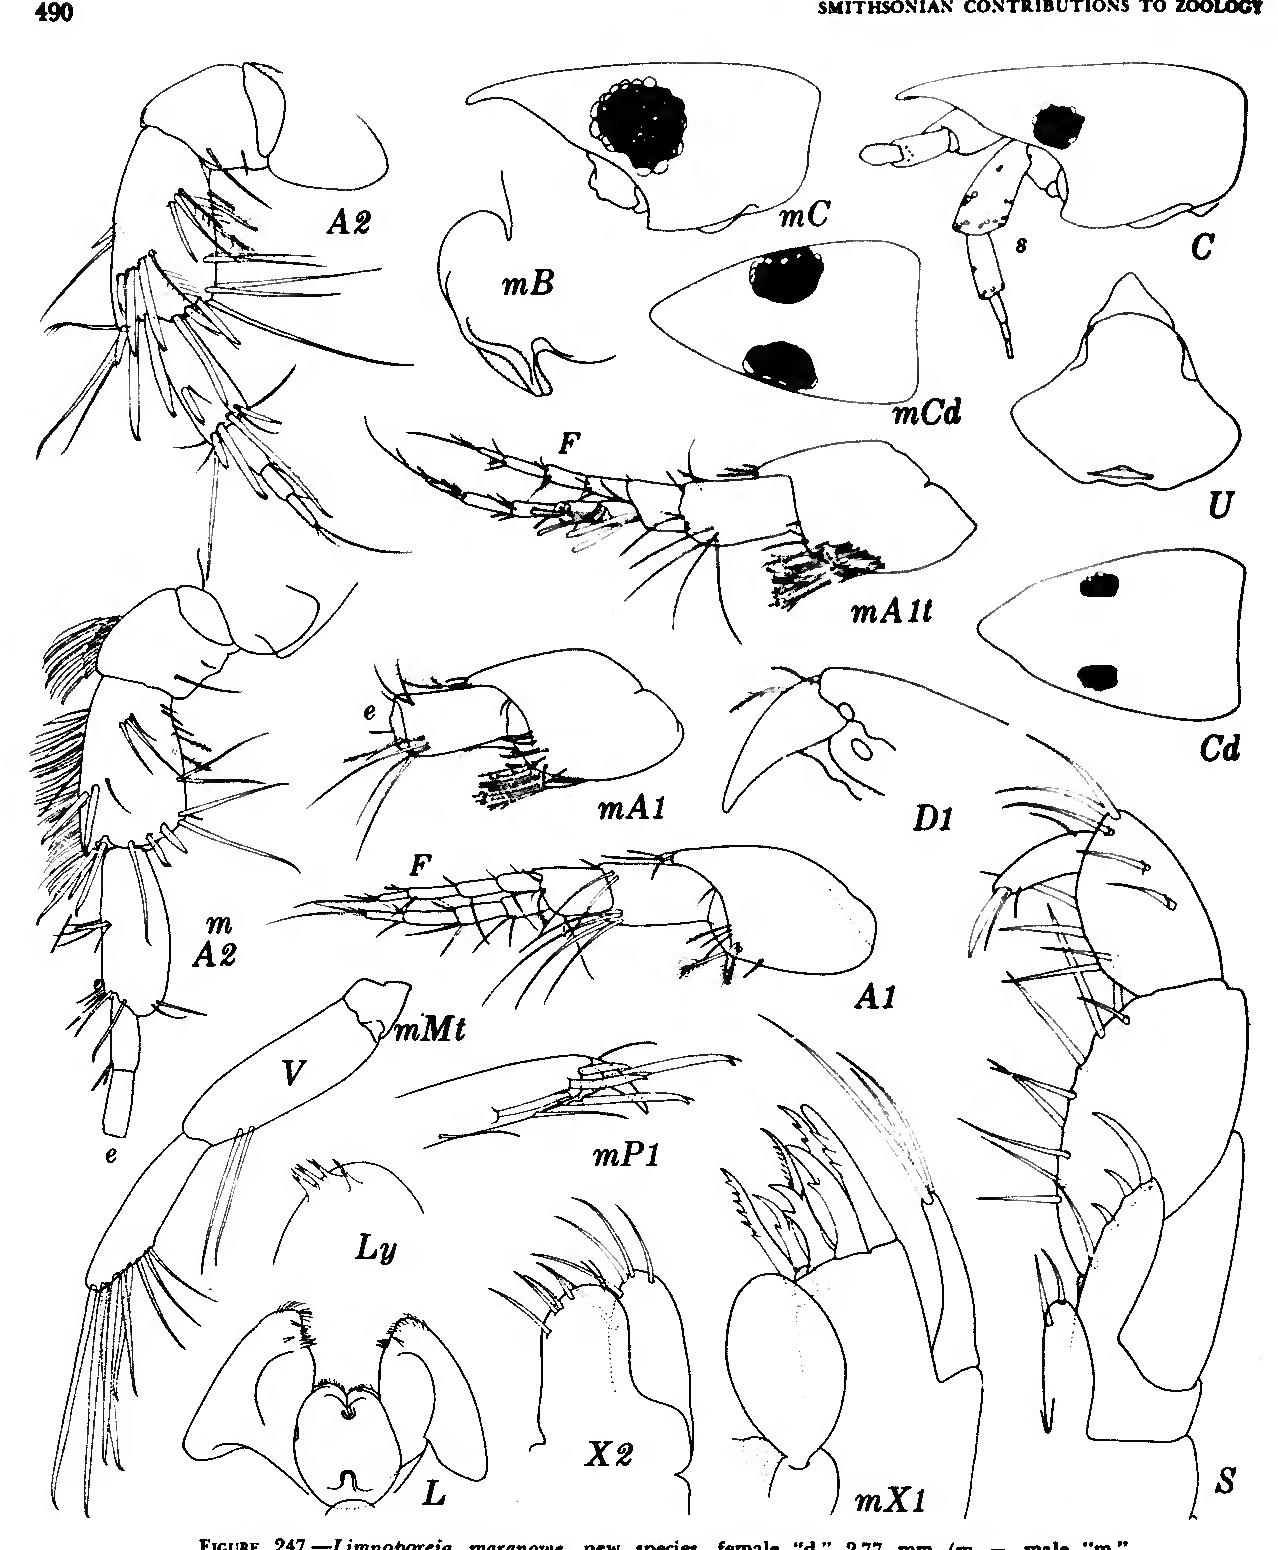 figure 247